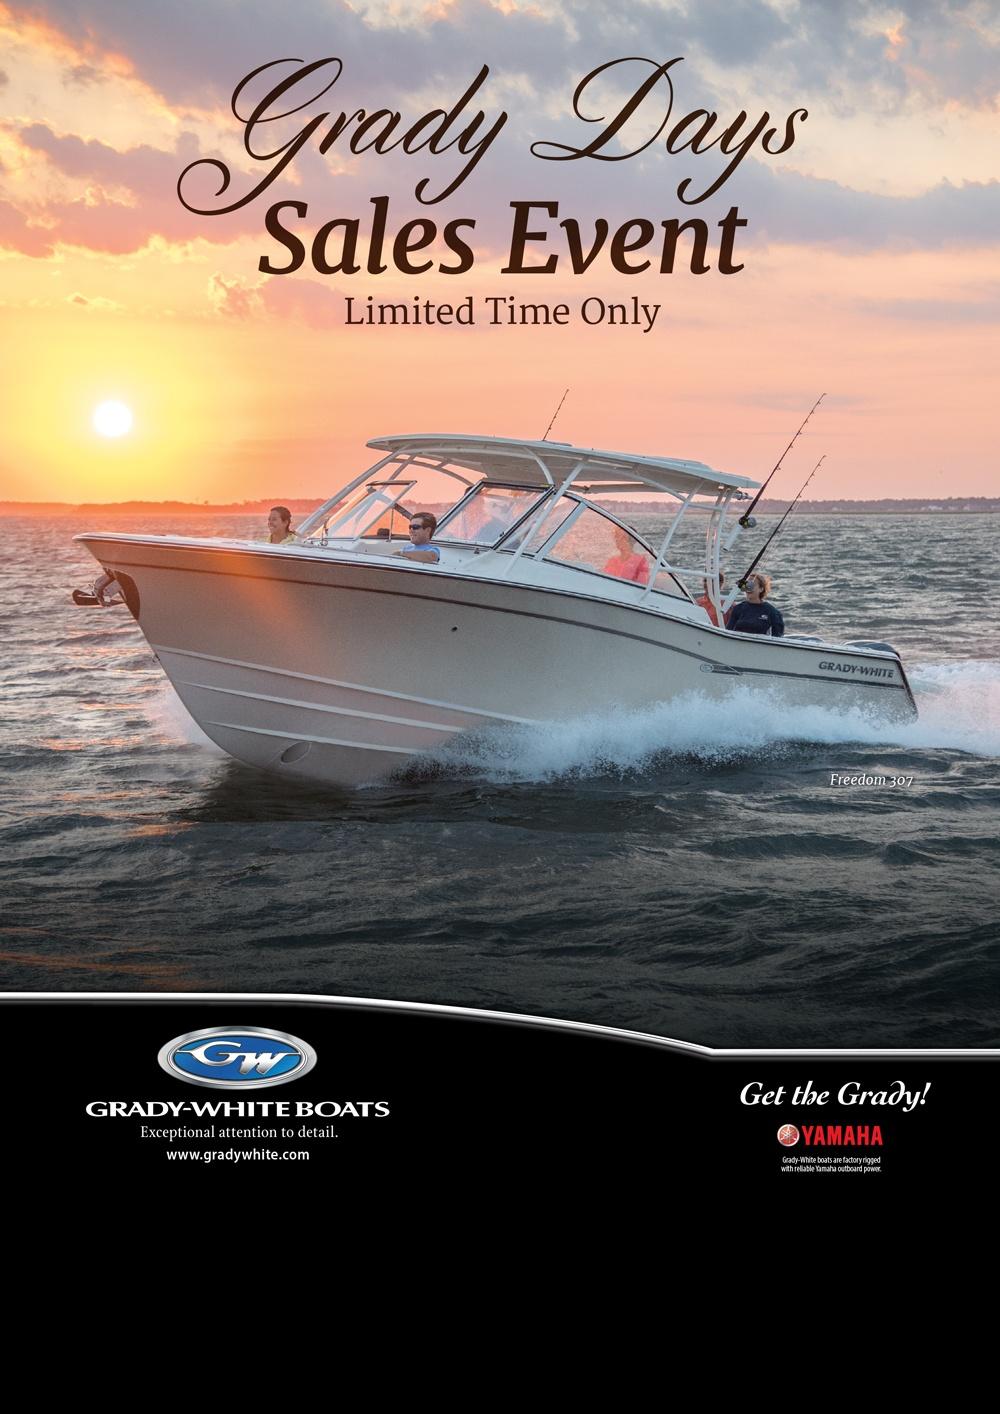 Grady-White Summer Savings & Yamaha Promotion